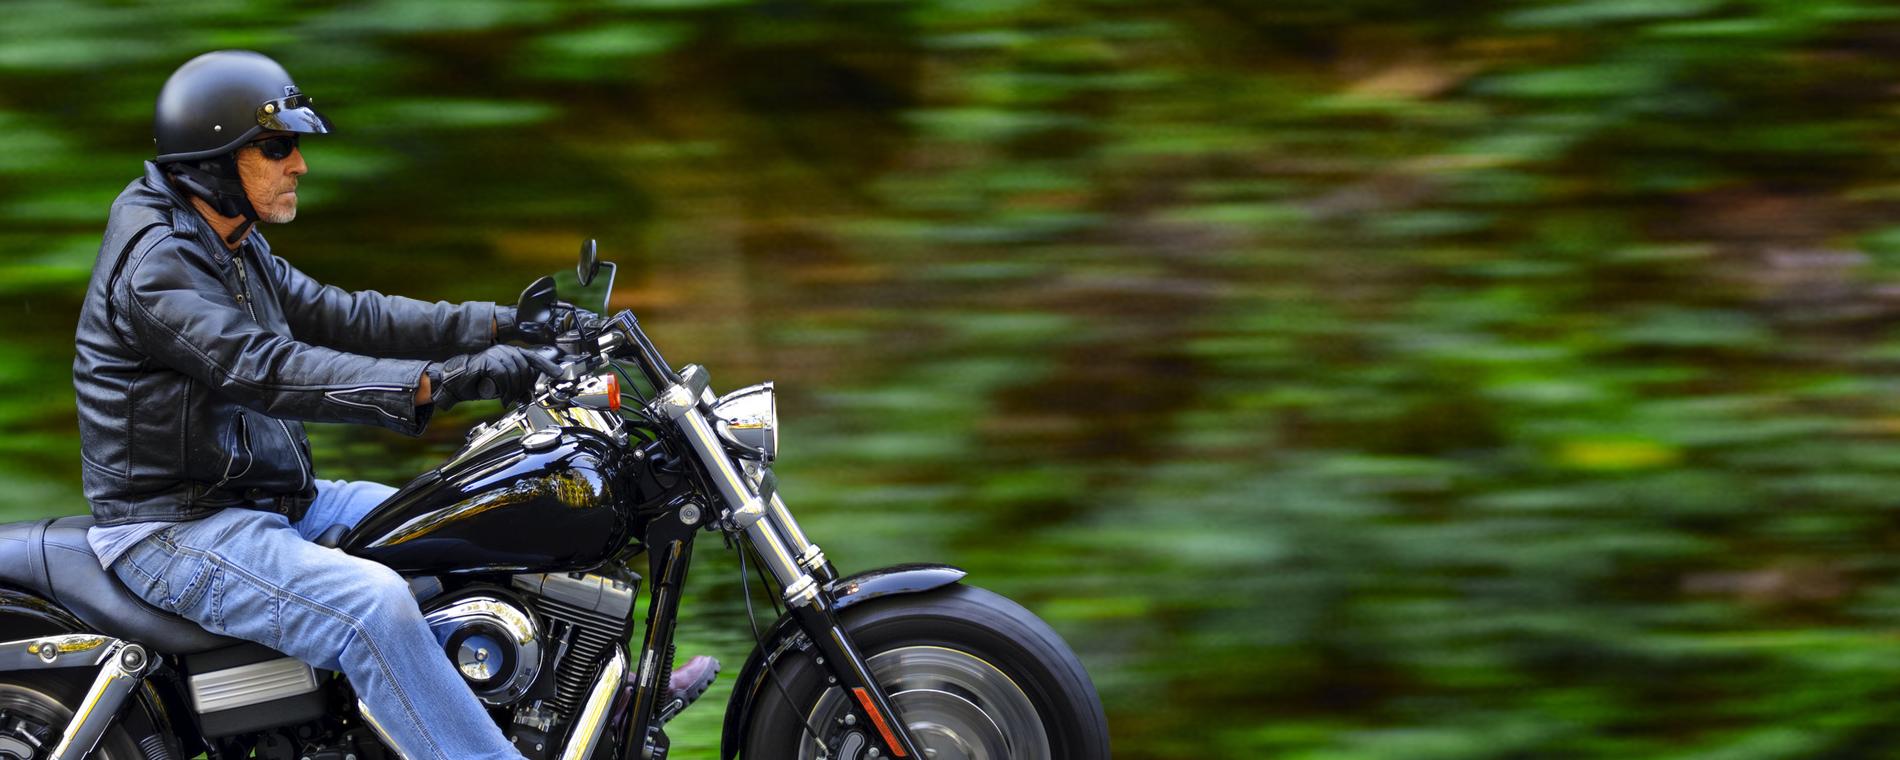 slider-1_0006_MOTORCYCLE